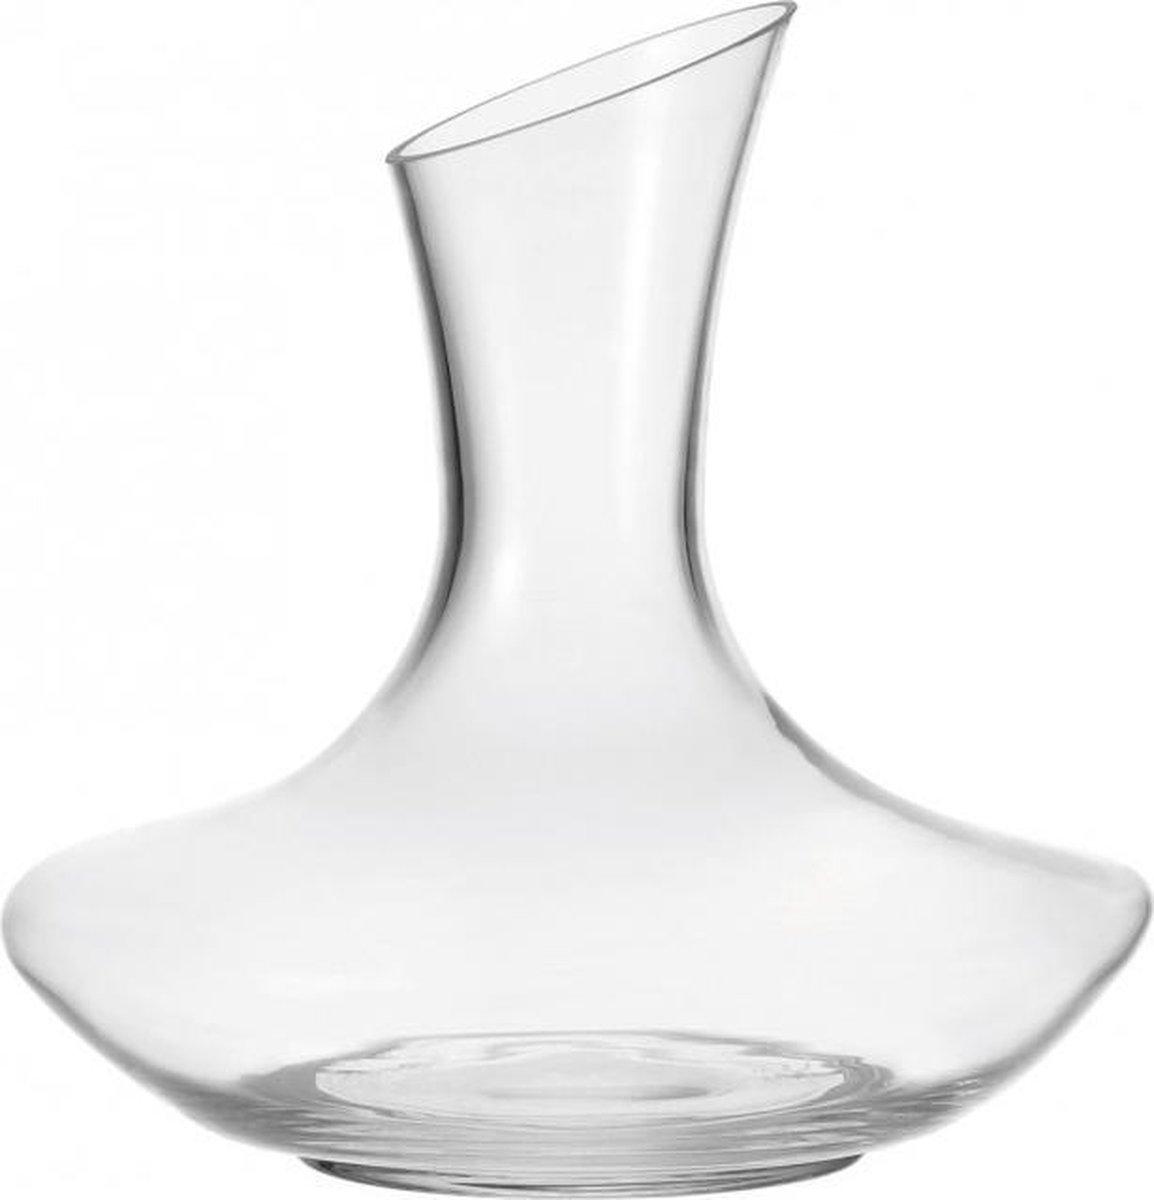 Leonardo Daily Decanteer Karaf - 0.75L - Glas